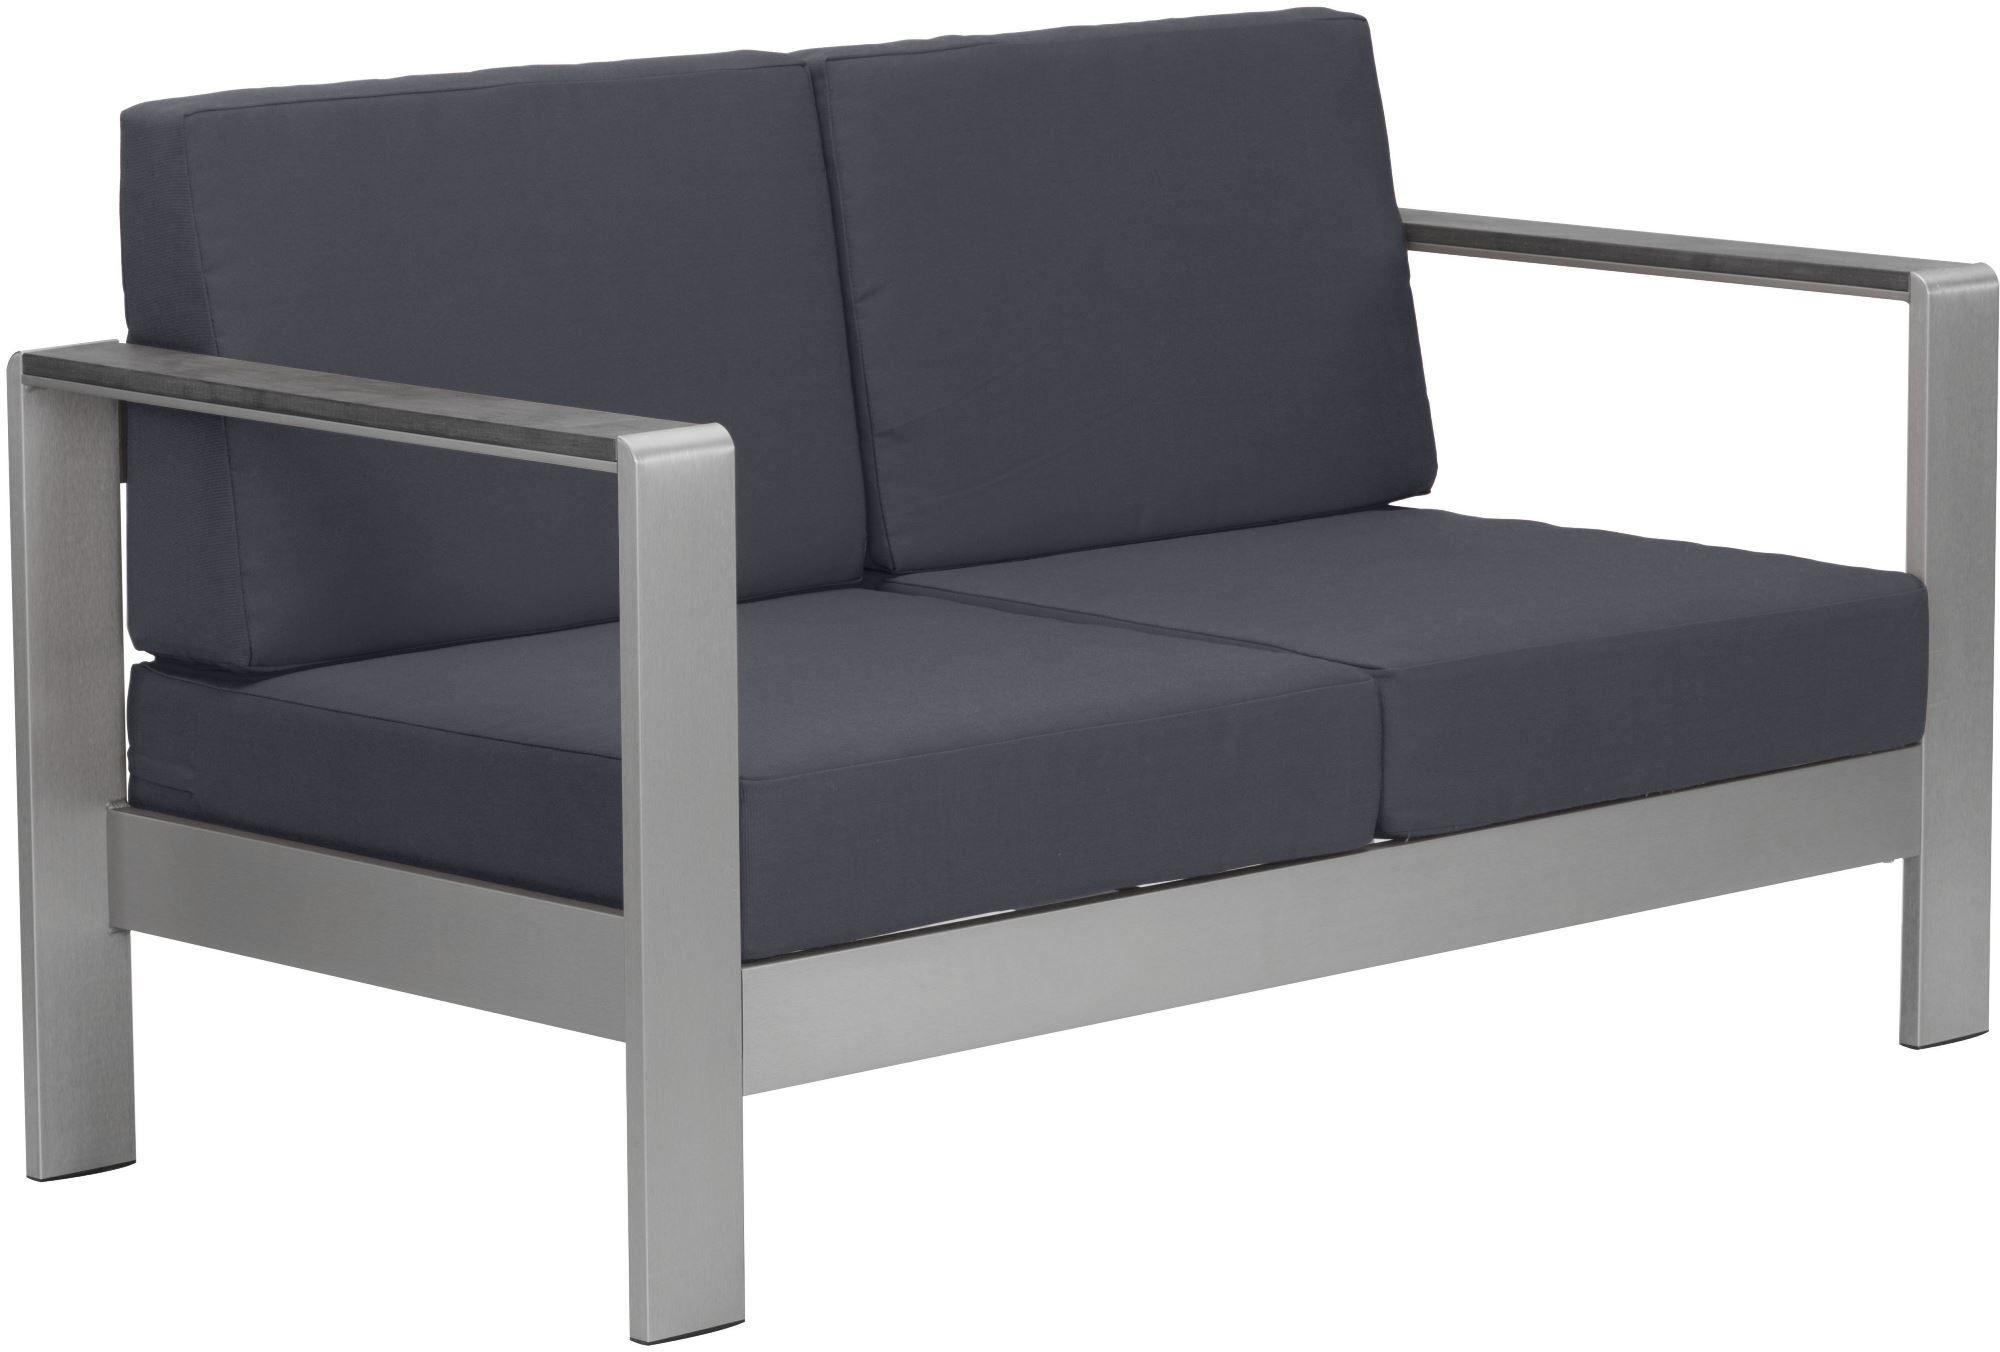 Cosmopolitan Dark Gray Sofa Cushions From Zuo